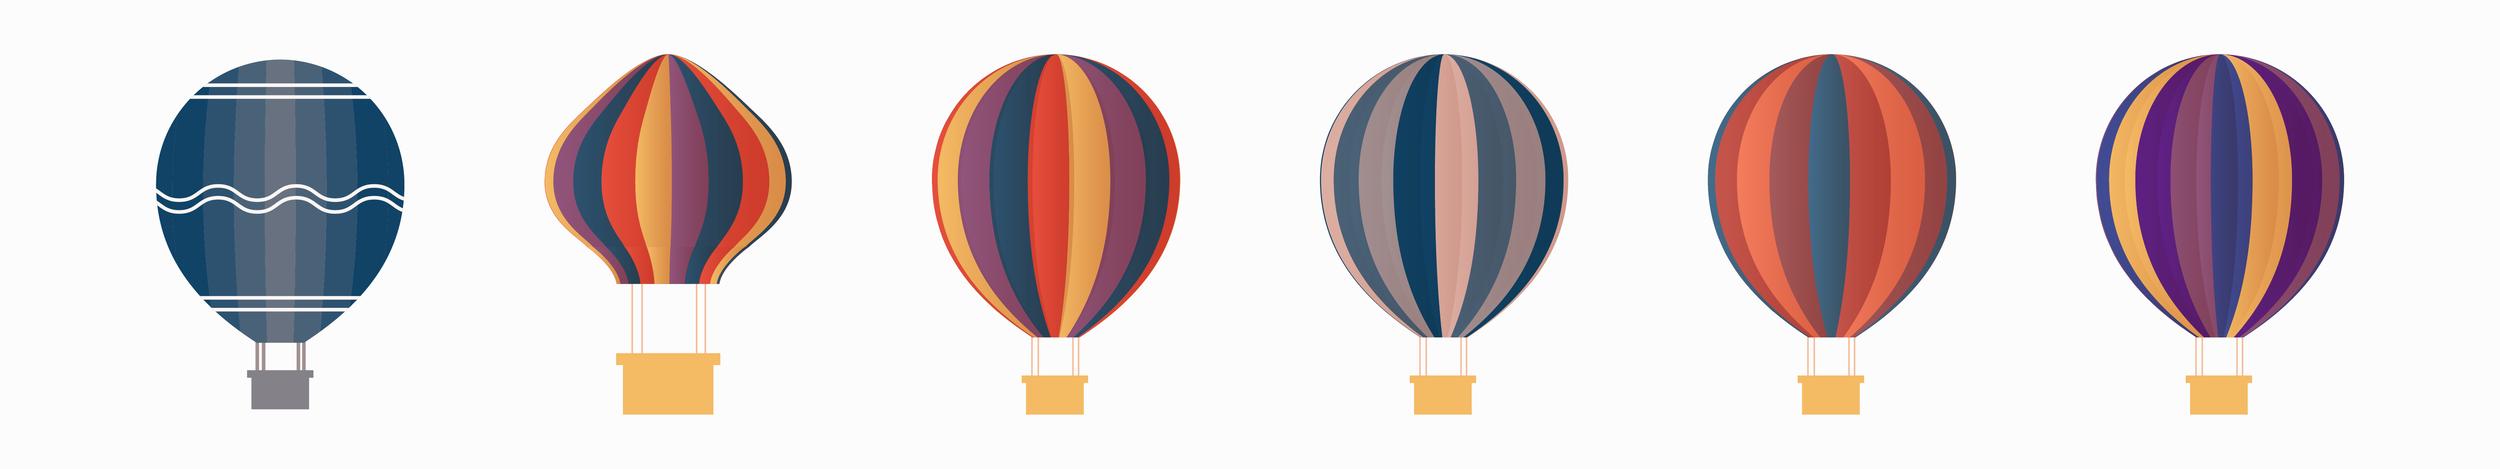 Hot Air Balloon Exploration